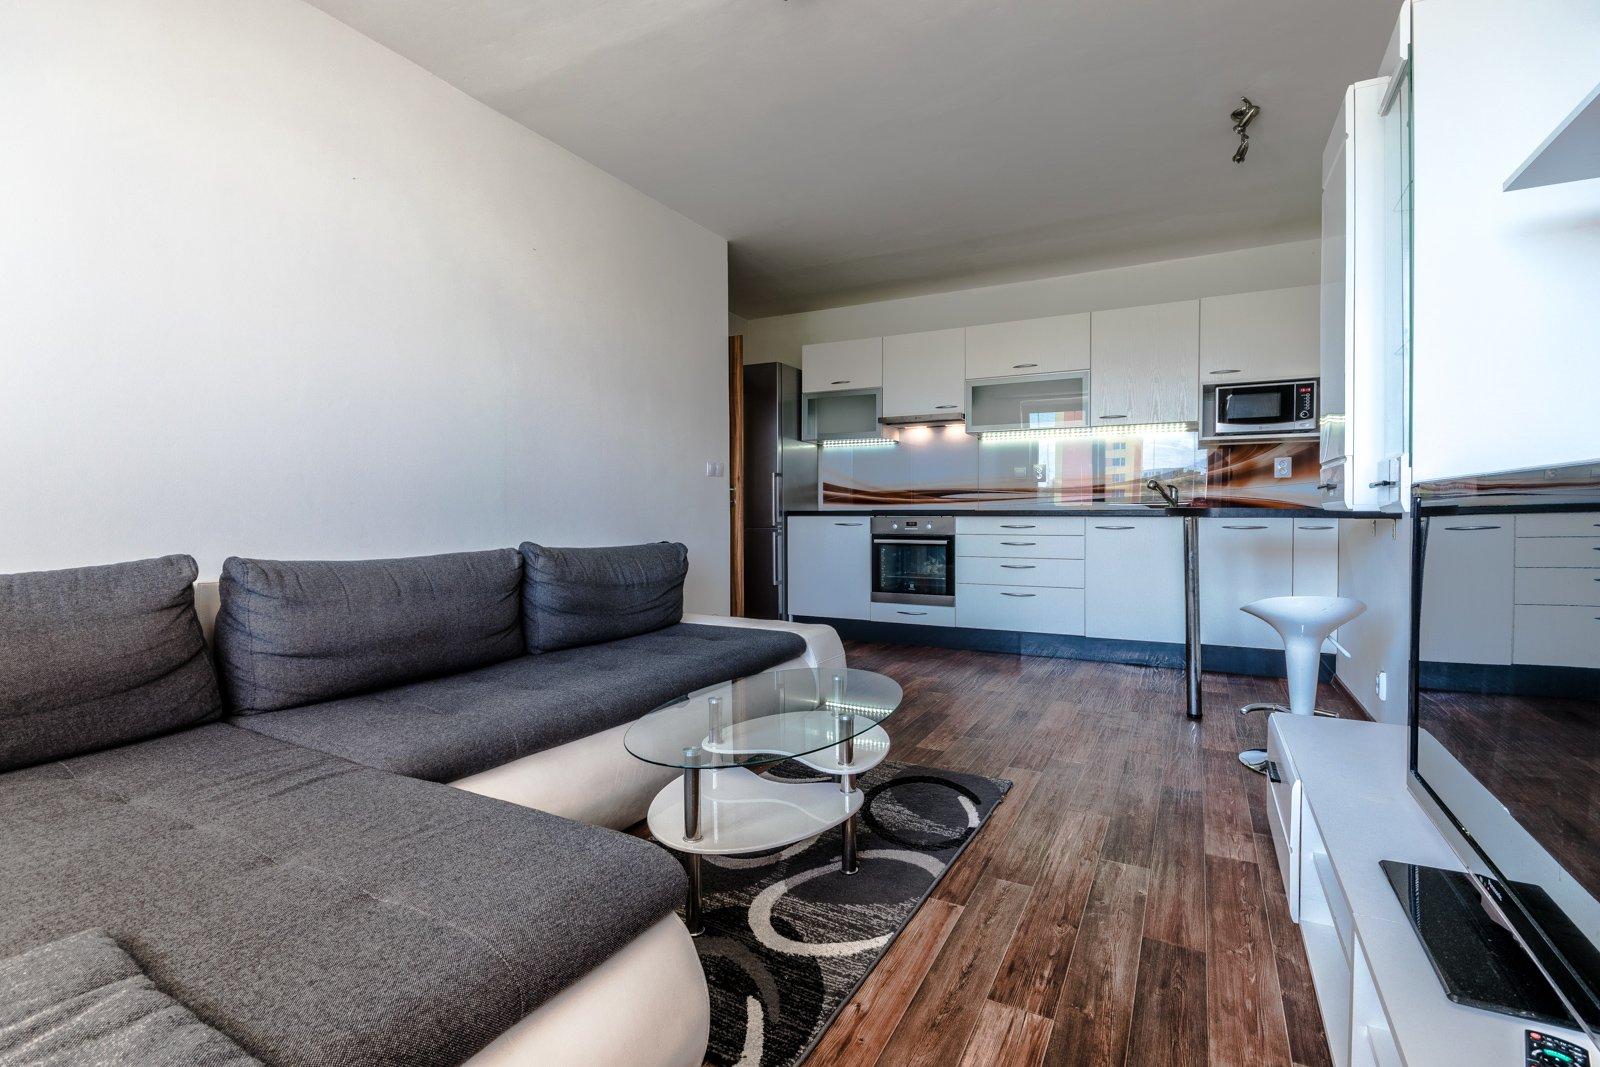 Podnájem bytu 2kk, ul. Tavolníkova Praha 4 – Krč